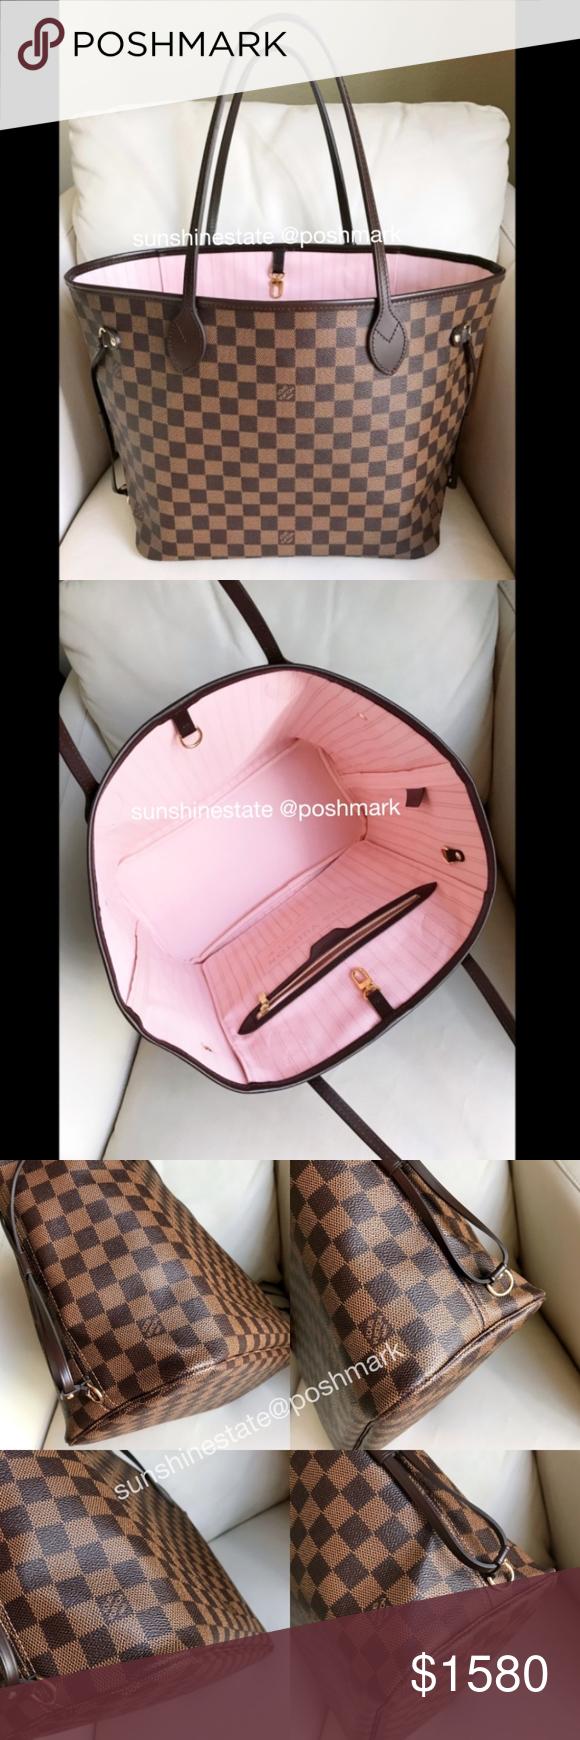 26cd94a1063a Louis Vuitton Neverfull MM Rose Ballerine Brand new condition Louis Vuitton  Neverfull MM Damier Ebene Rose Ballerine blush light pink lining.